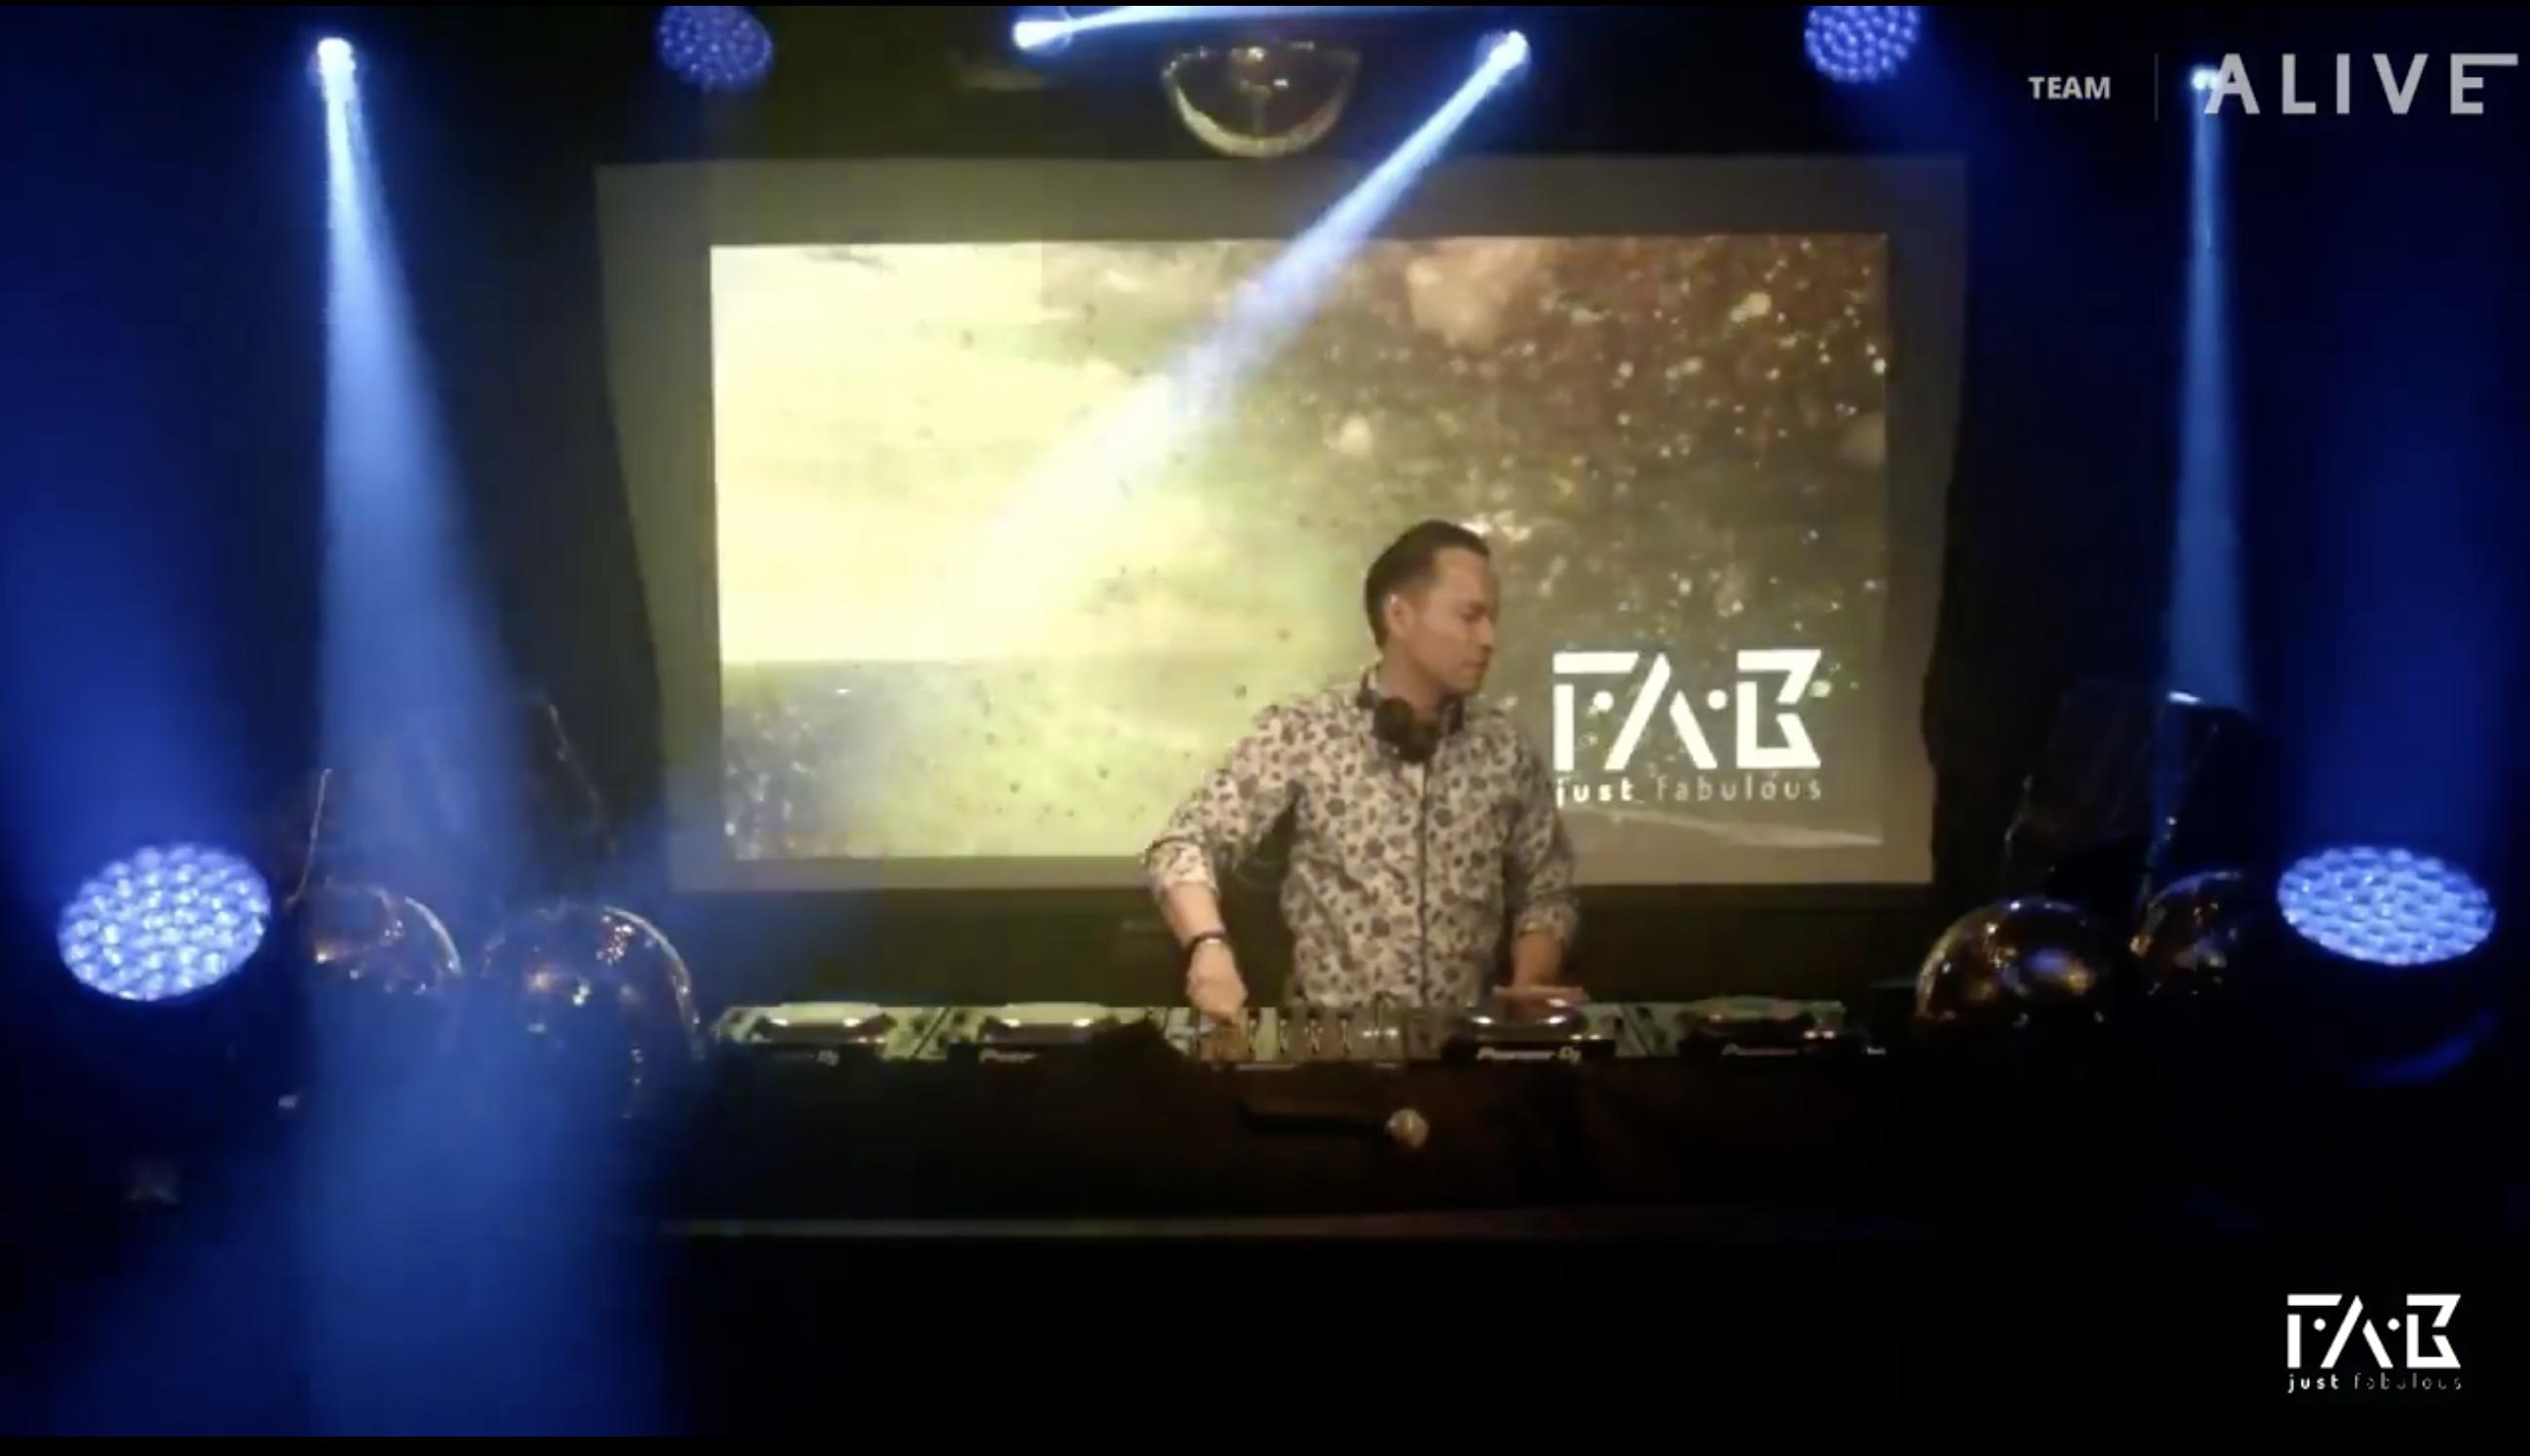 DJ FAB Livestream Team ALIVE